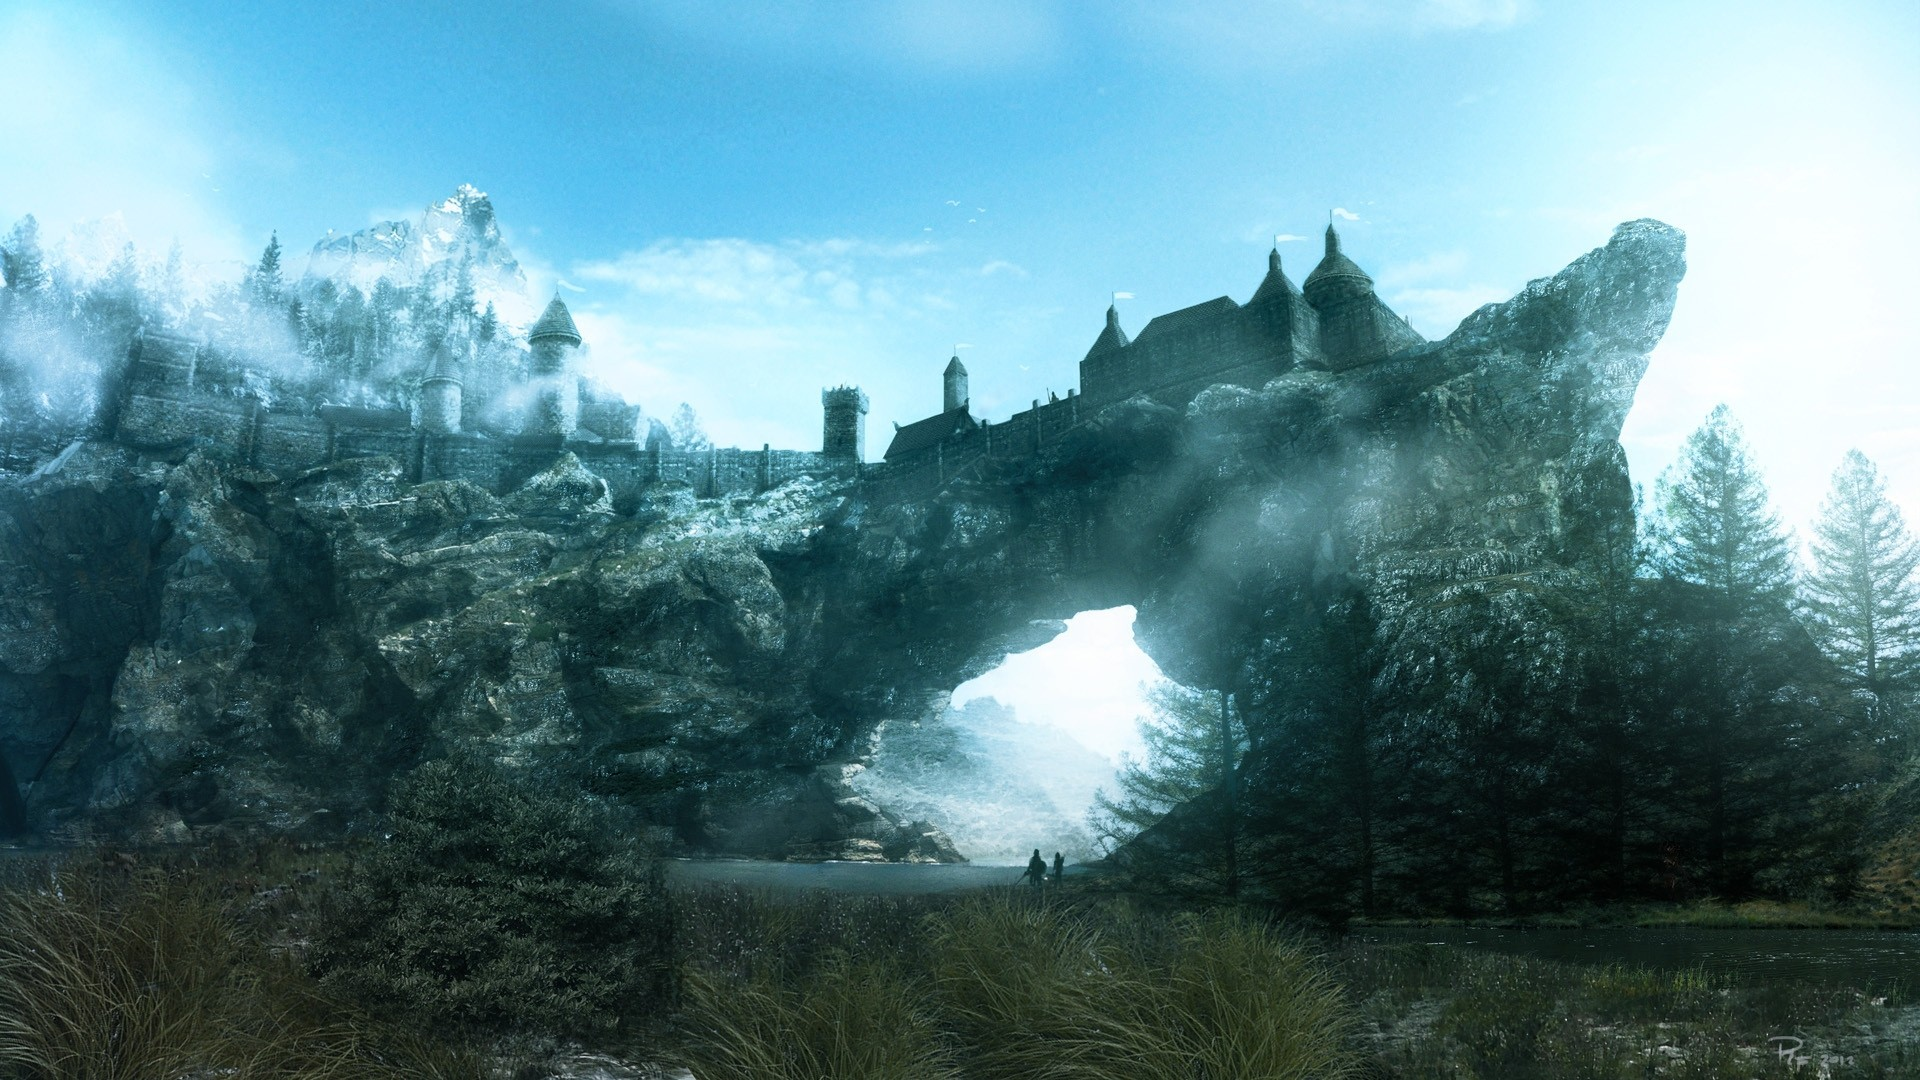 Elder Scrolls Desktop wallpaper